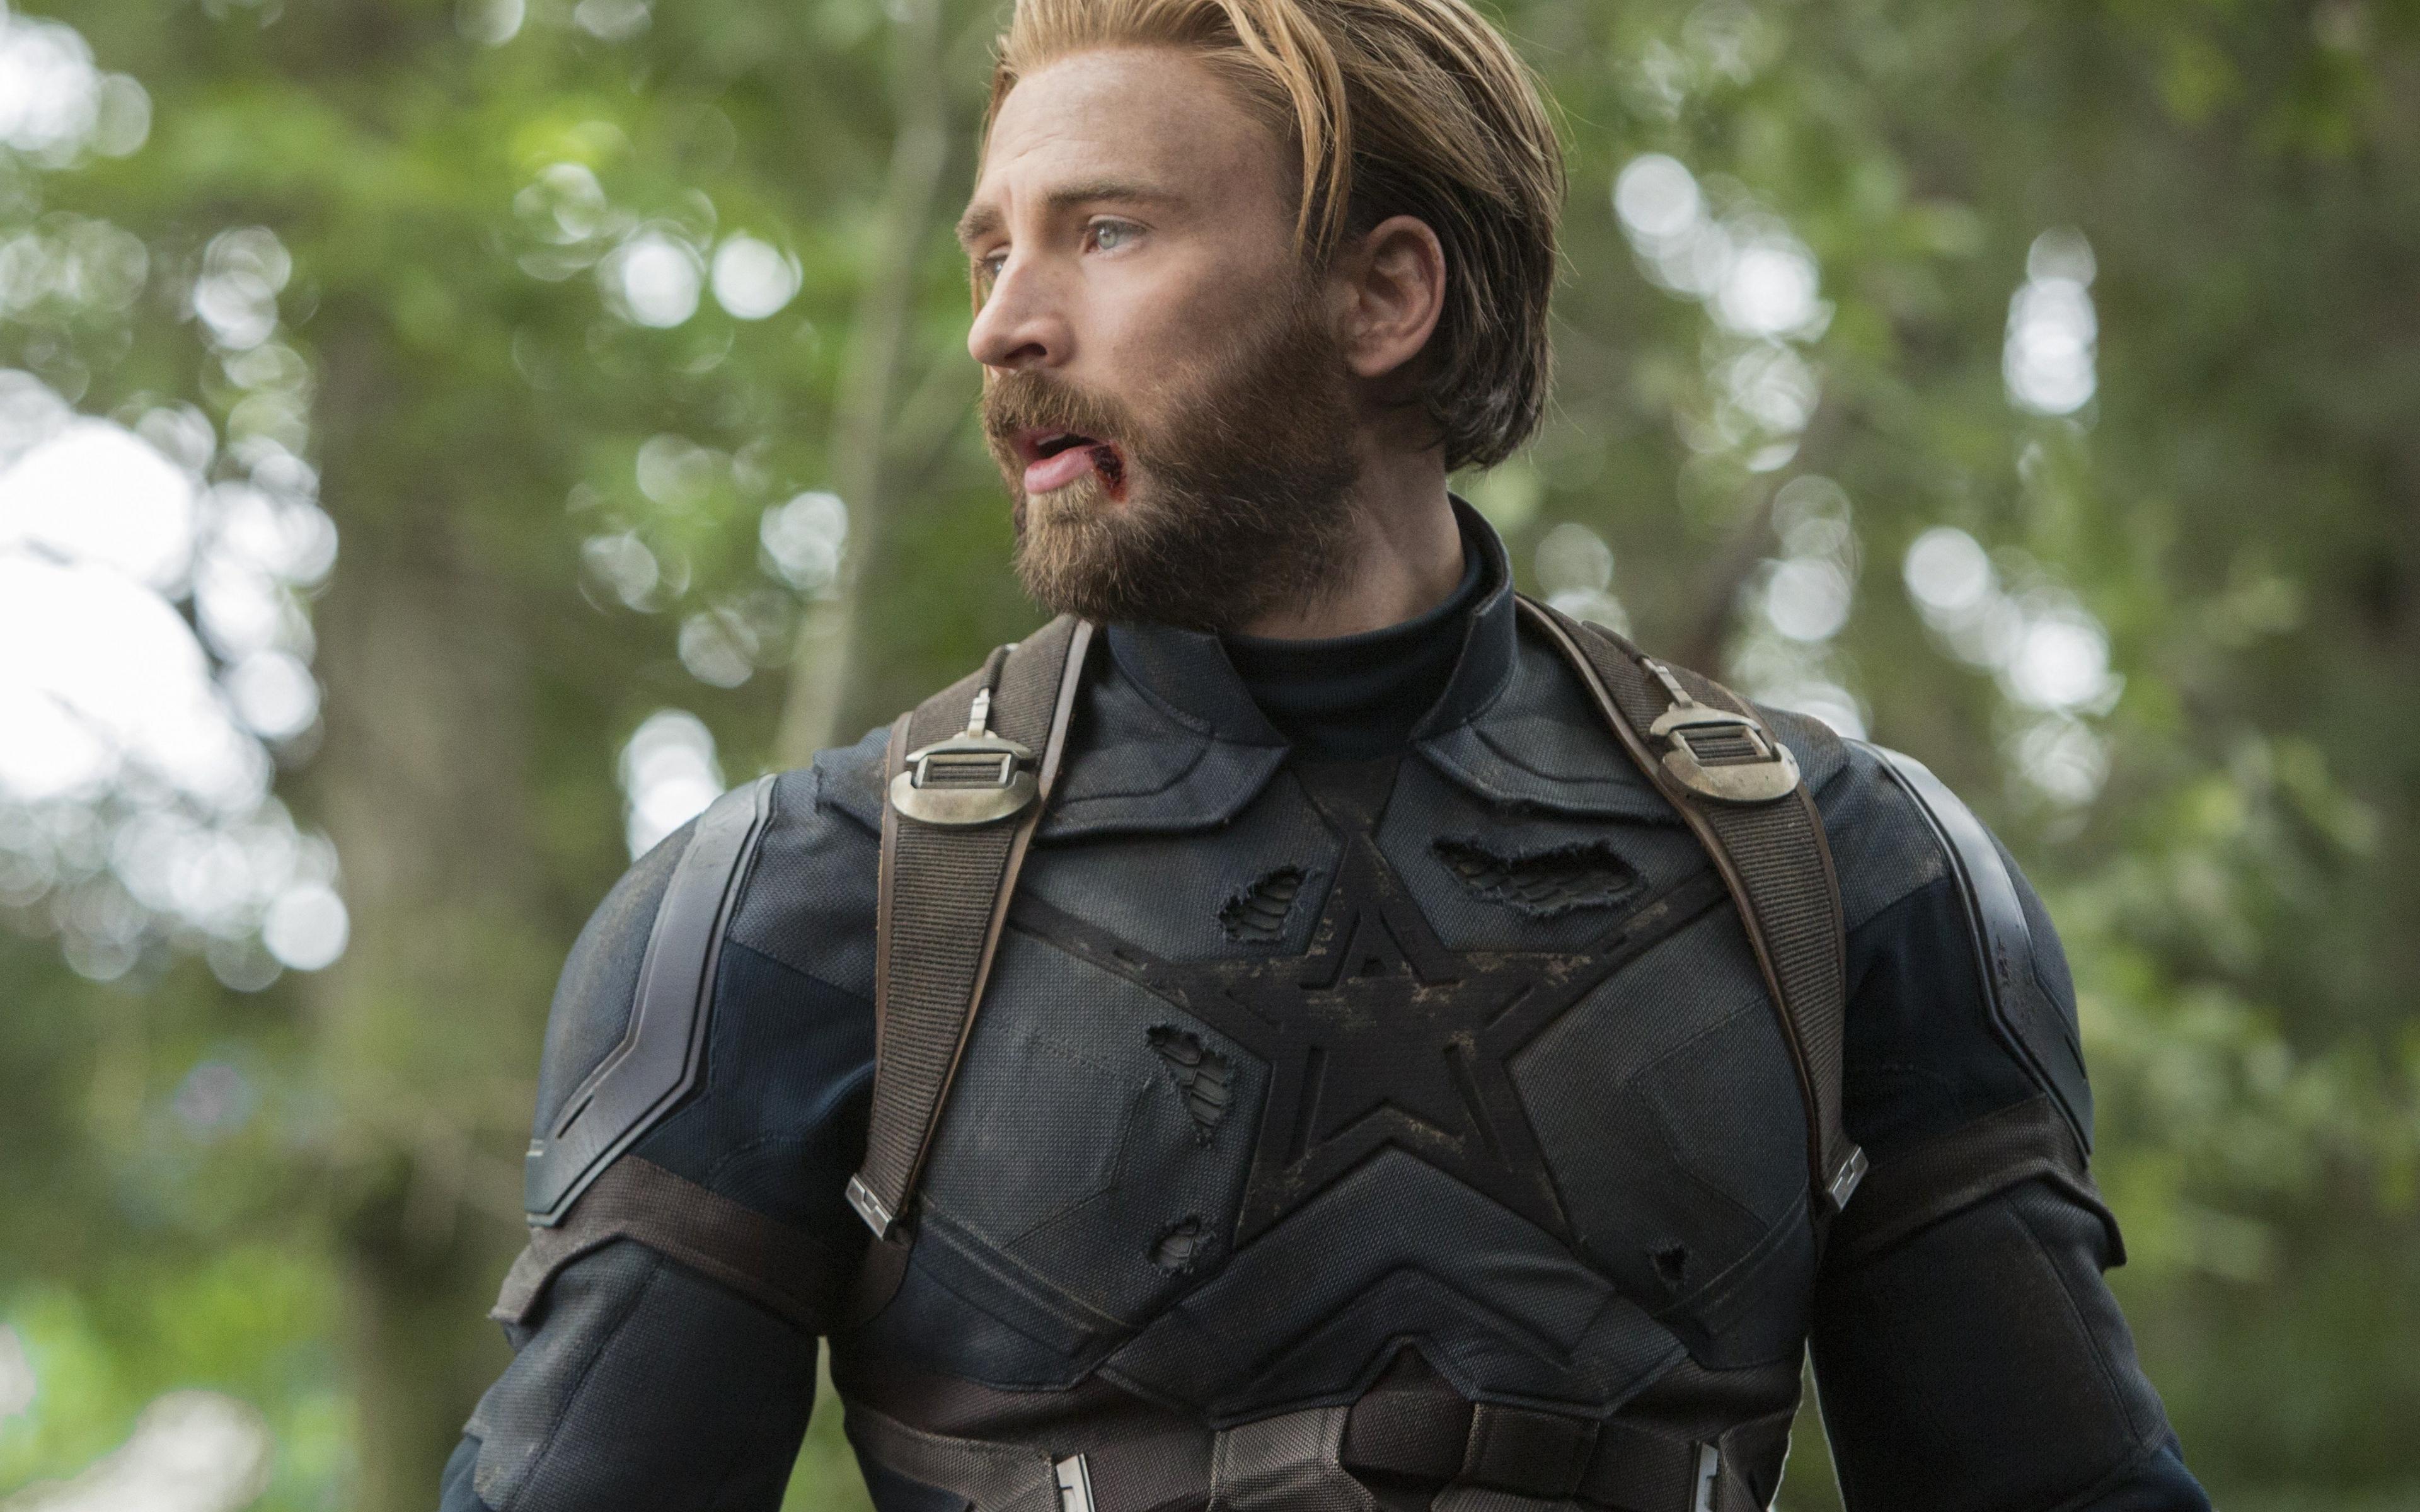 Download 3840x2400 Wallpaper Captain America Chris Evans